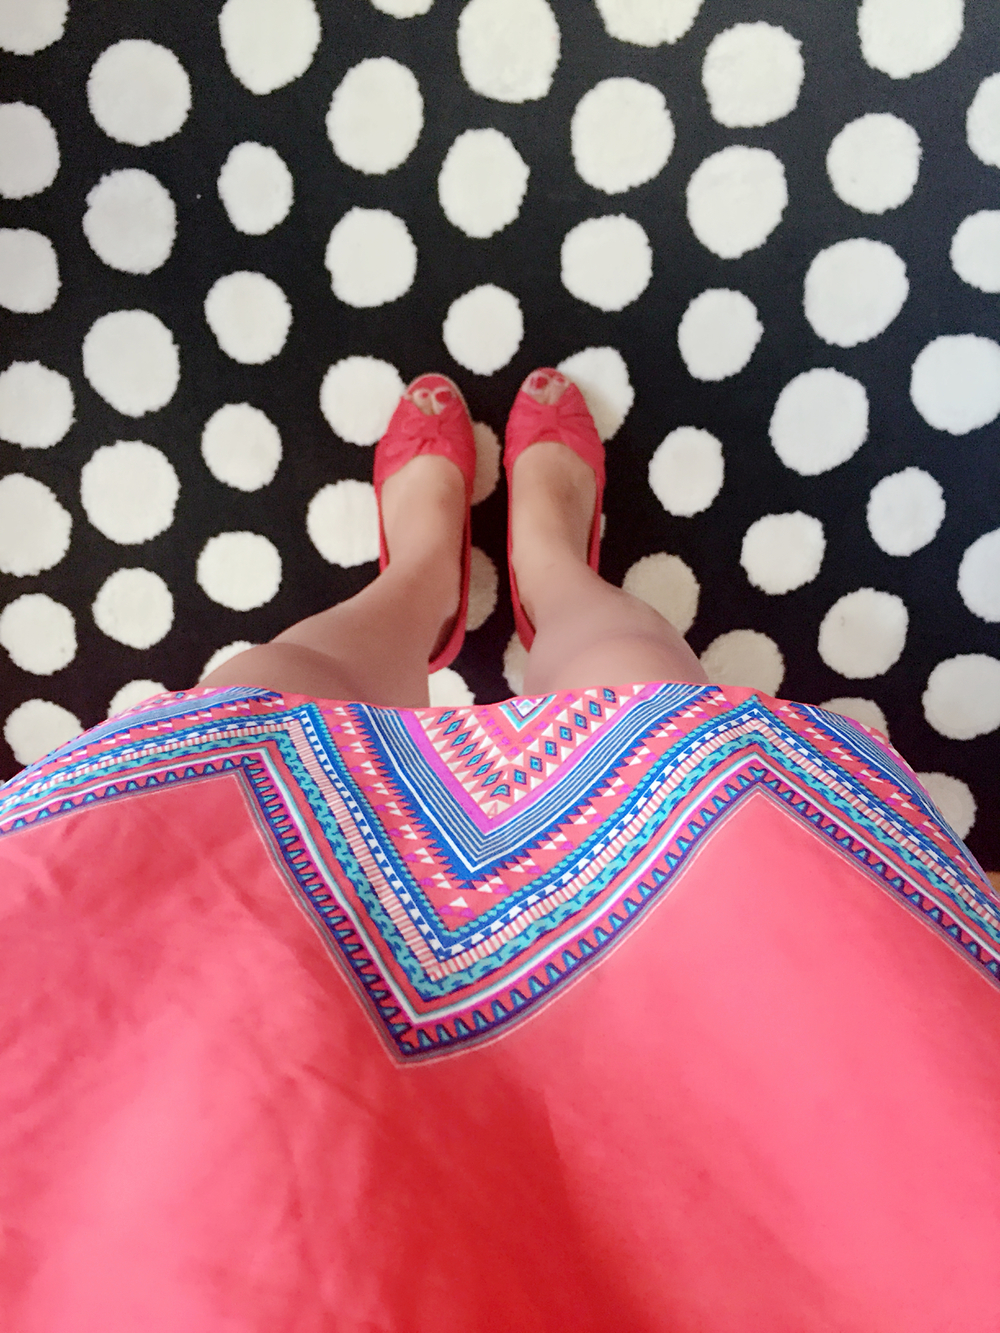 Dress: Marshall's / Shoes: Payless / Earrings: Target / Wallet: Michael Kohrs / Lipliner: Lord & Berry 3035 / Eyeliner: Loreal / Rug: IKEA :)